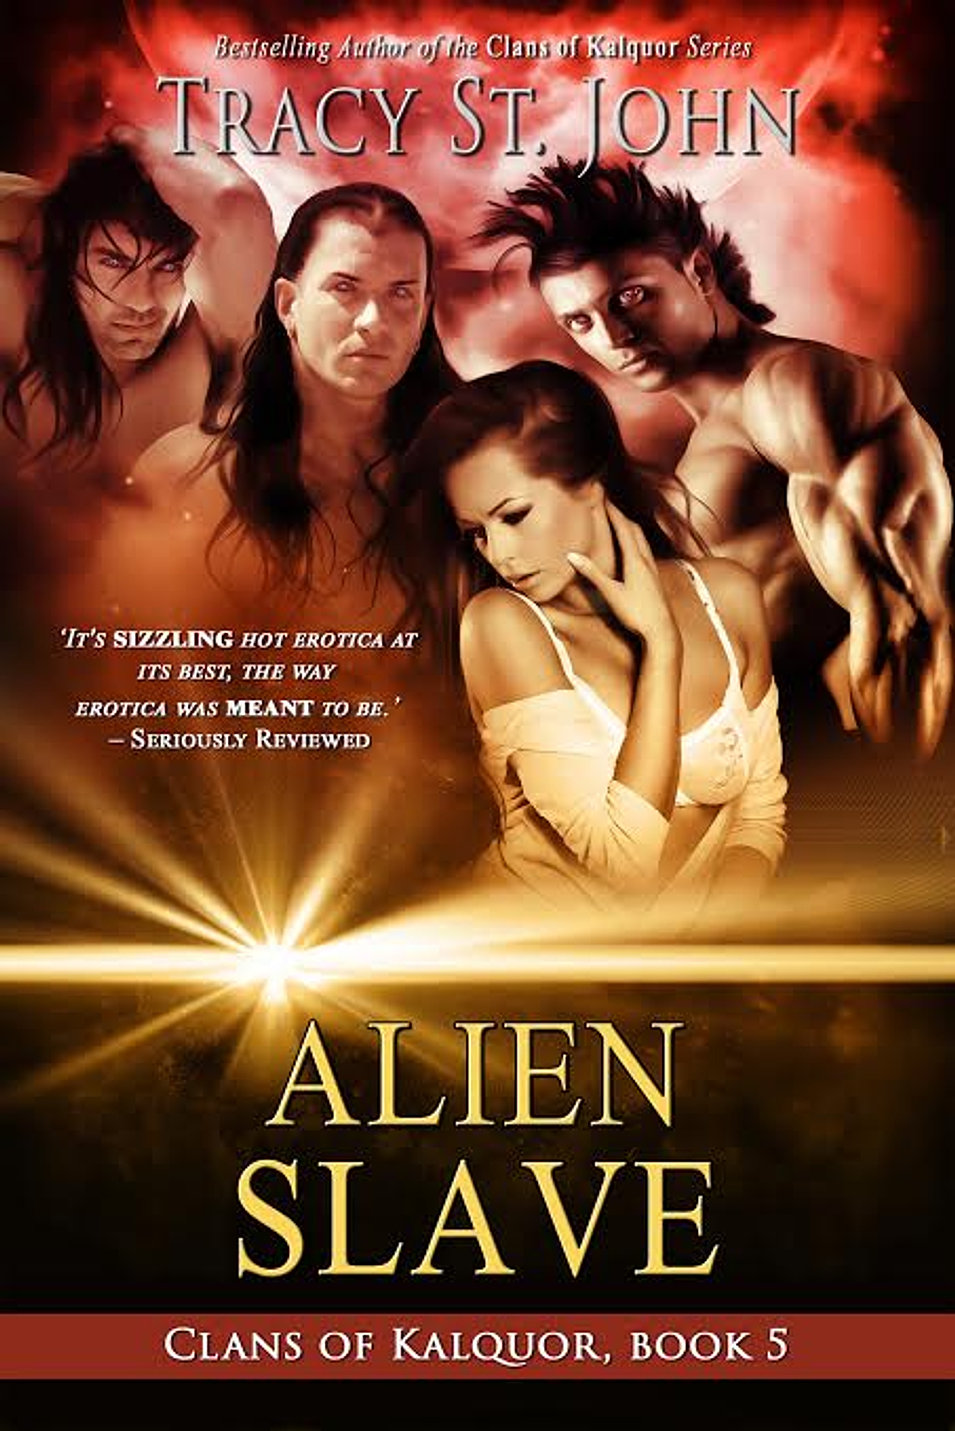 alien slave.jpg